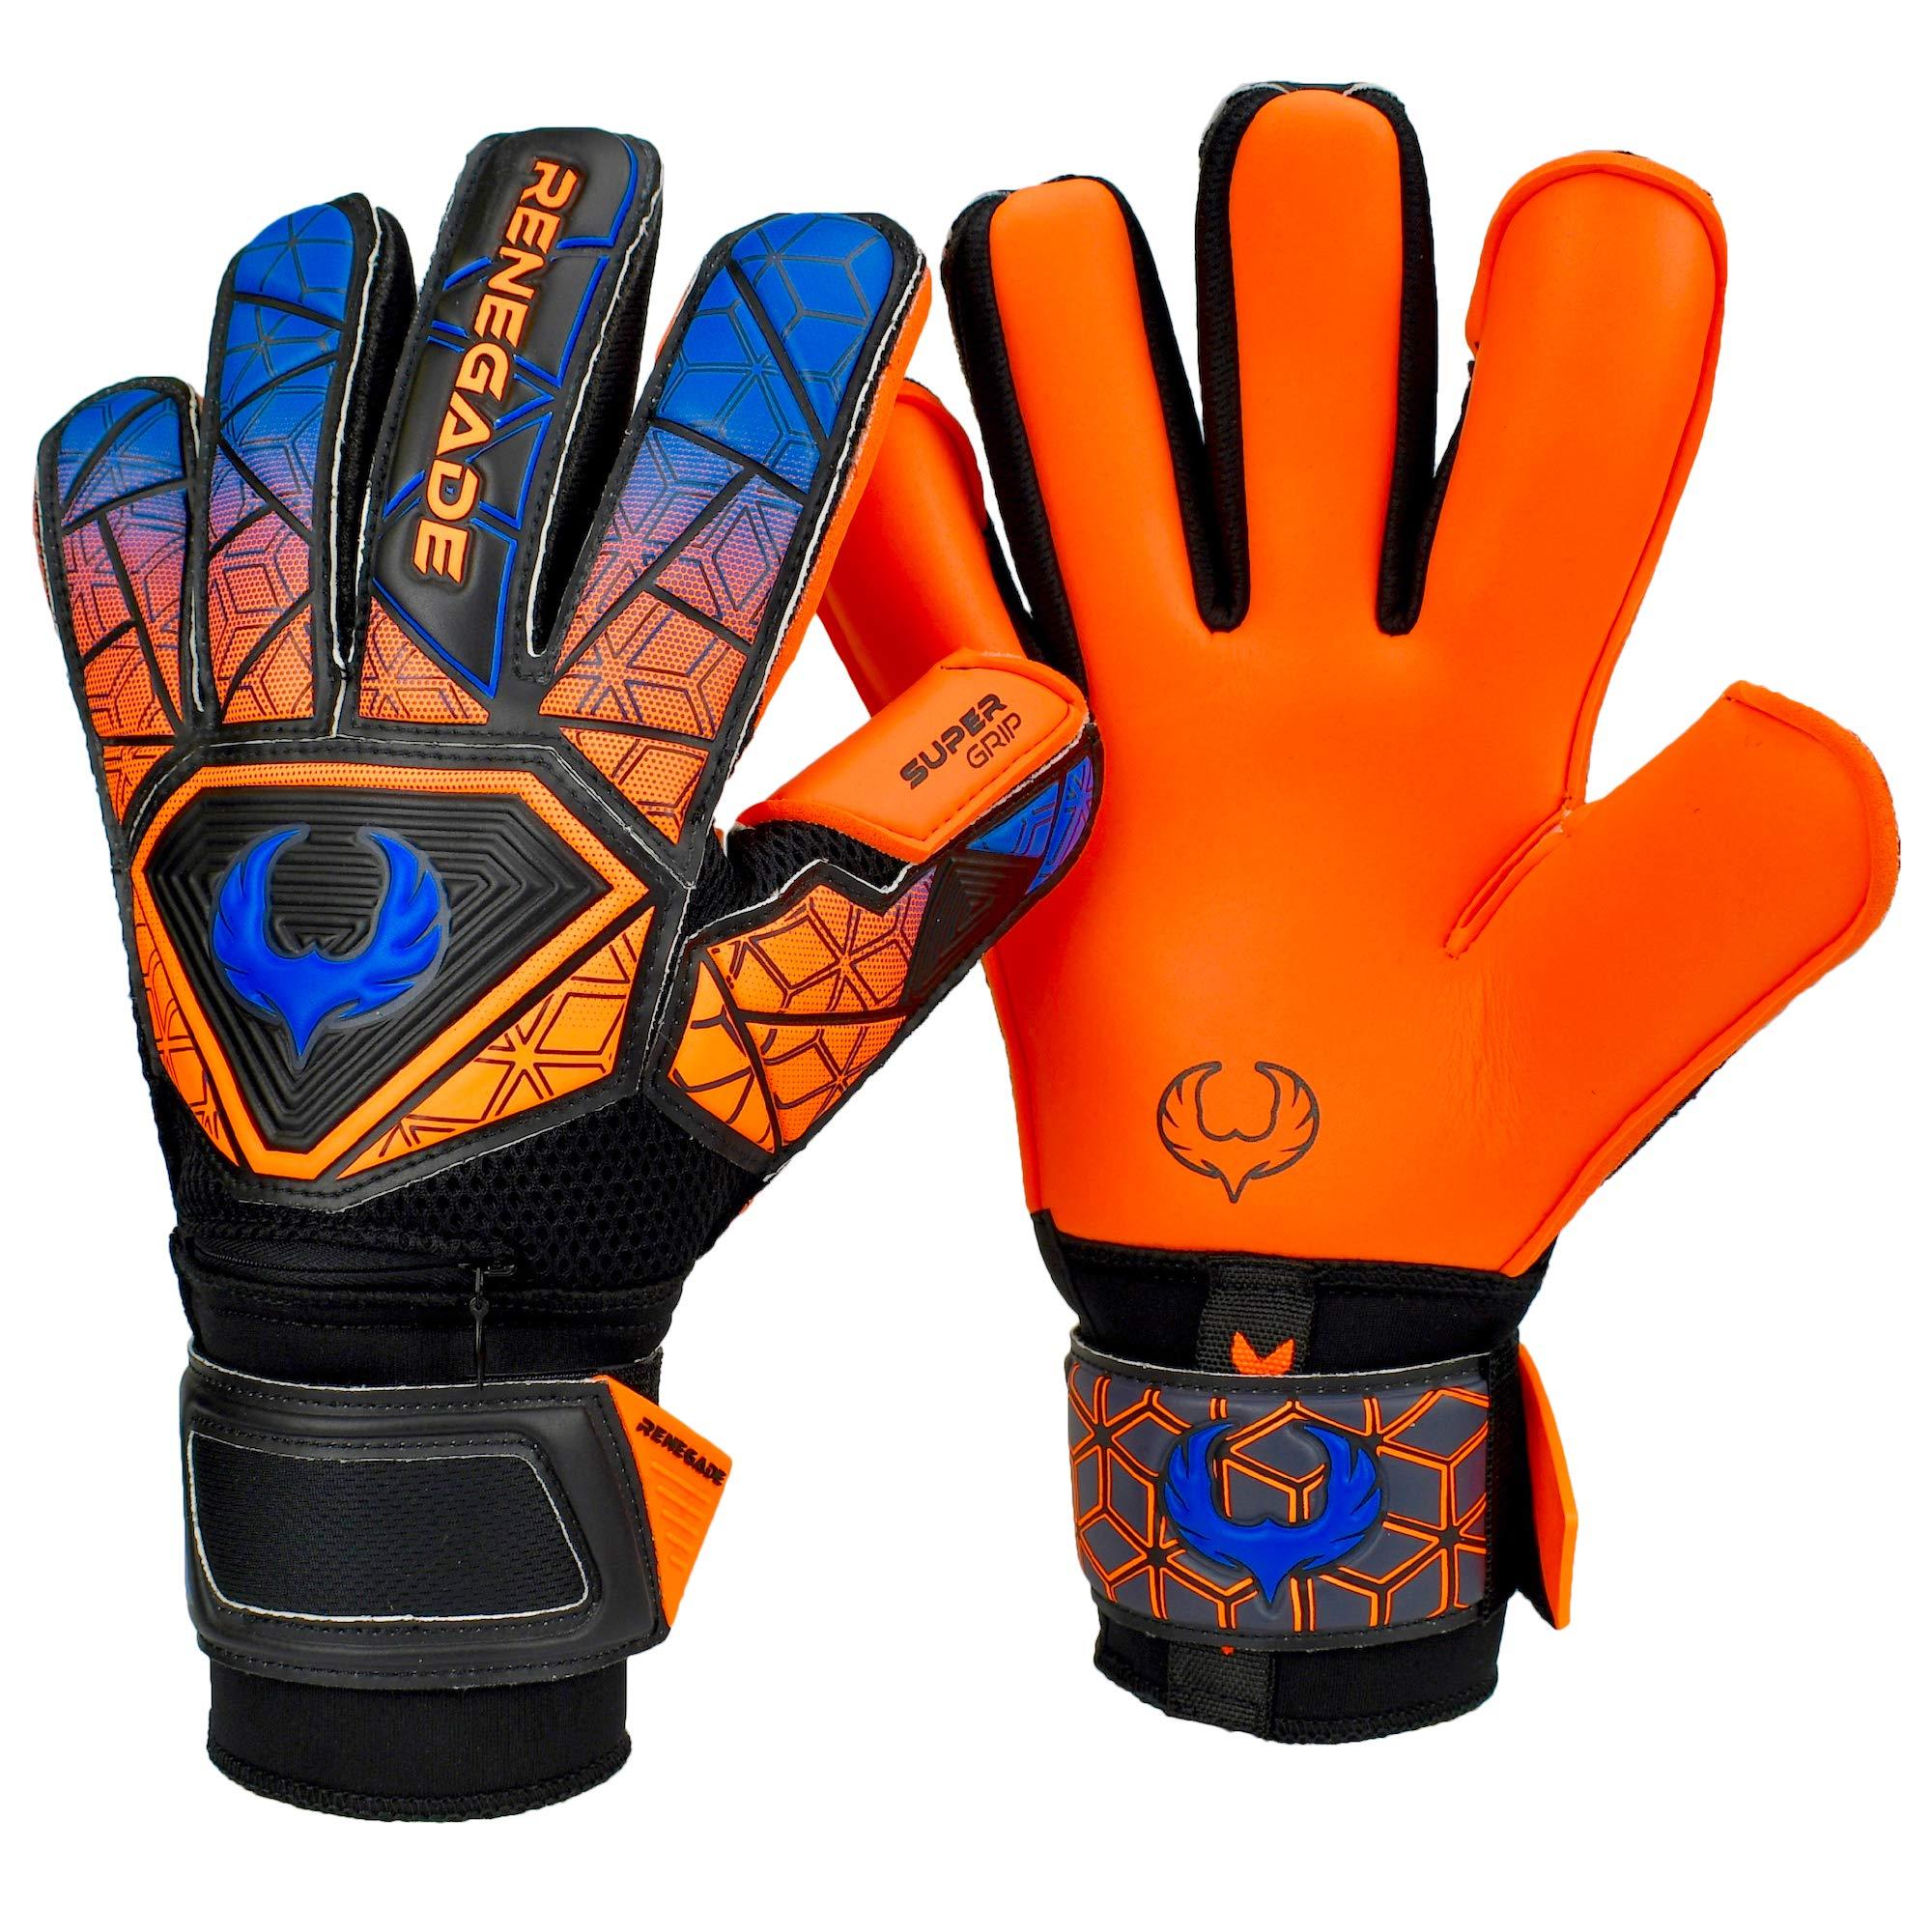 Renegade GK Vortex Salvo Hybrid Cut Level 3 Adult & Youth Goalkeeper Gloves Kids & Hypergrip Palms - Size 6 Goalie Gloves - Youth Soccer Goalie Gloves - Goal Keeper Gloves Kids - Orange, Blue, Black